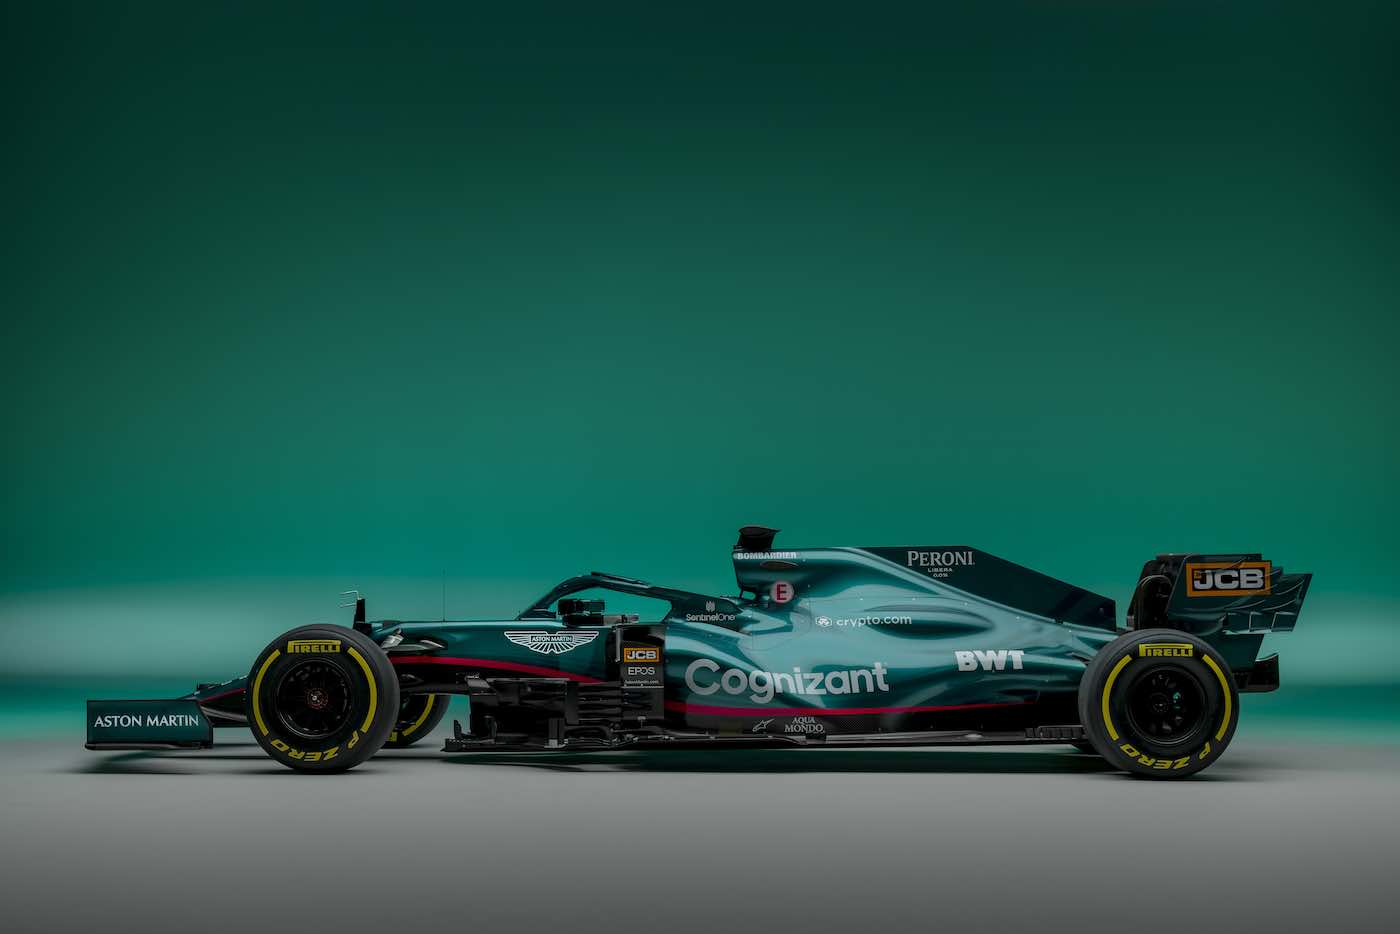 Las criptomonedas llegan al ?gran circo? de la Fórmula 1 de la mano de Aston Martin